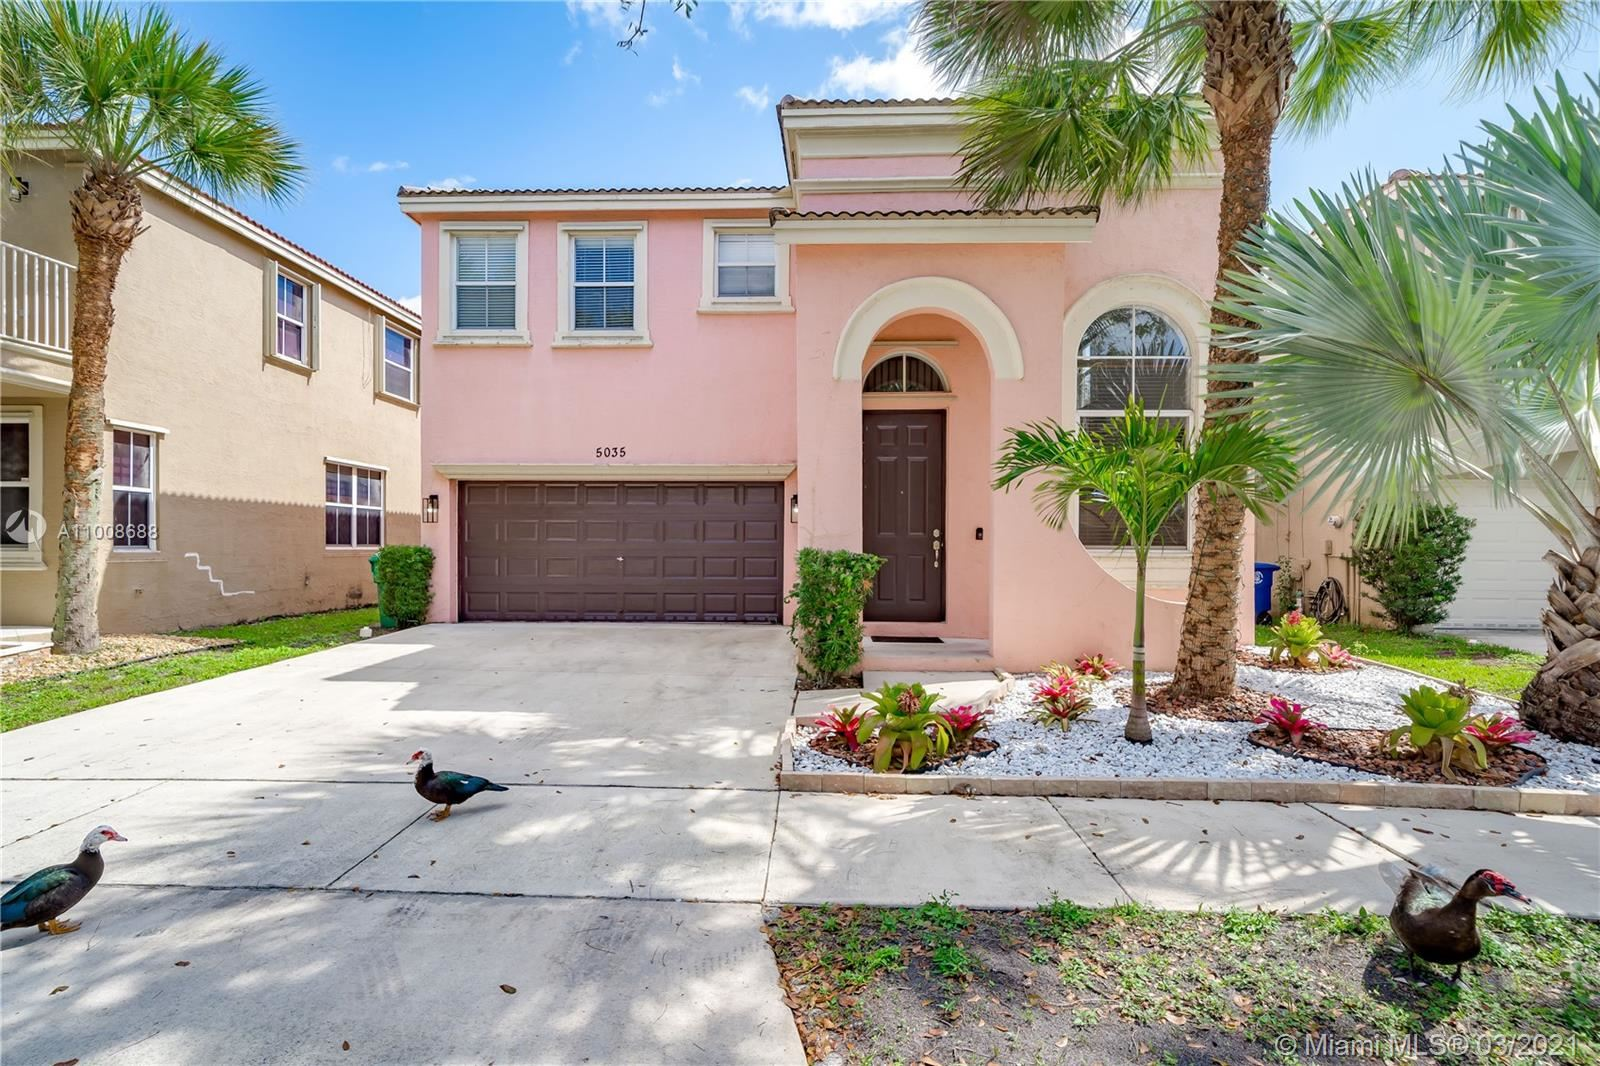 Photo of 5035 SW 155th Ave, Miramar, FL 33027 (MLS # A11008688)